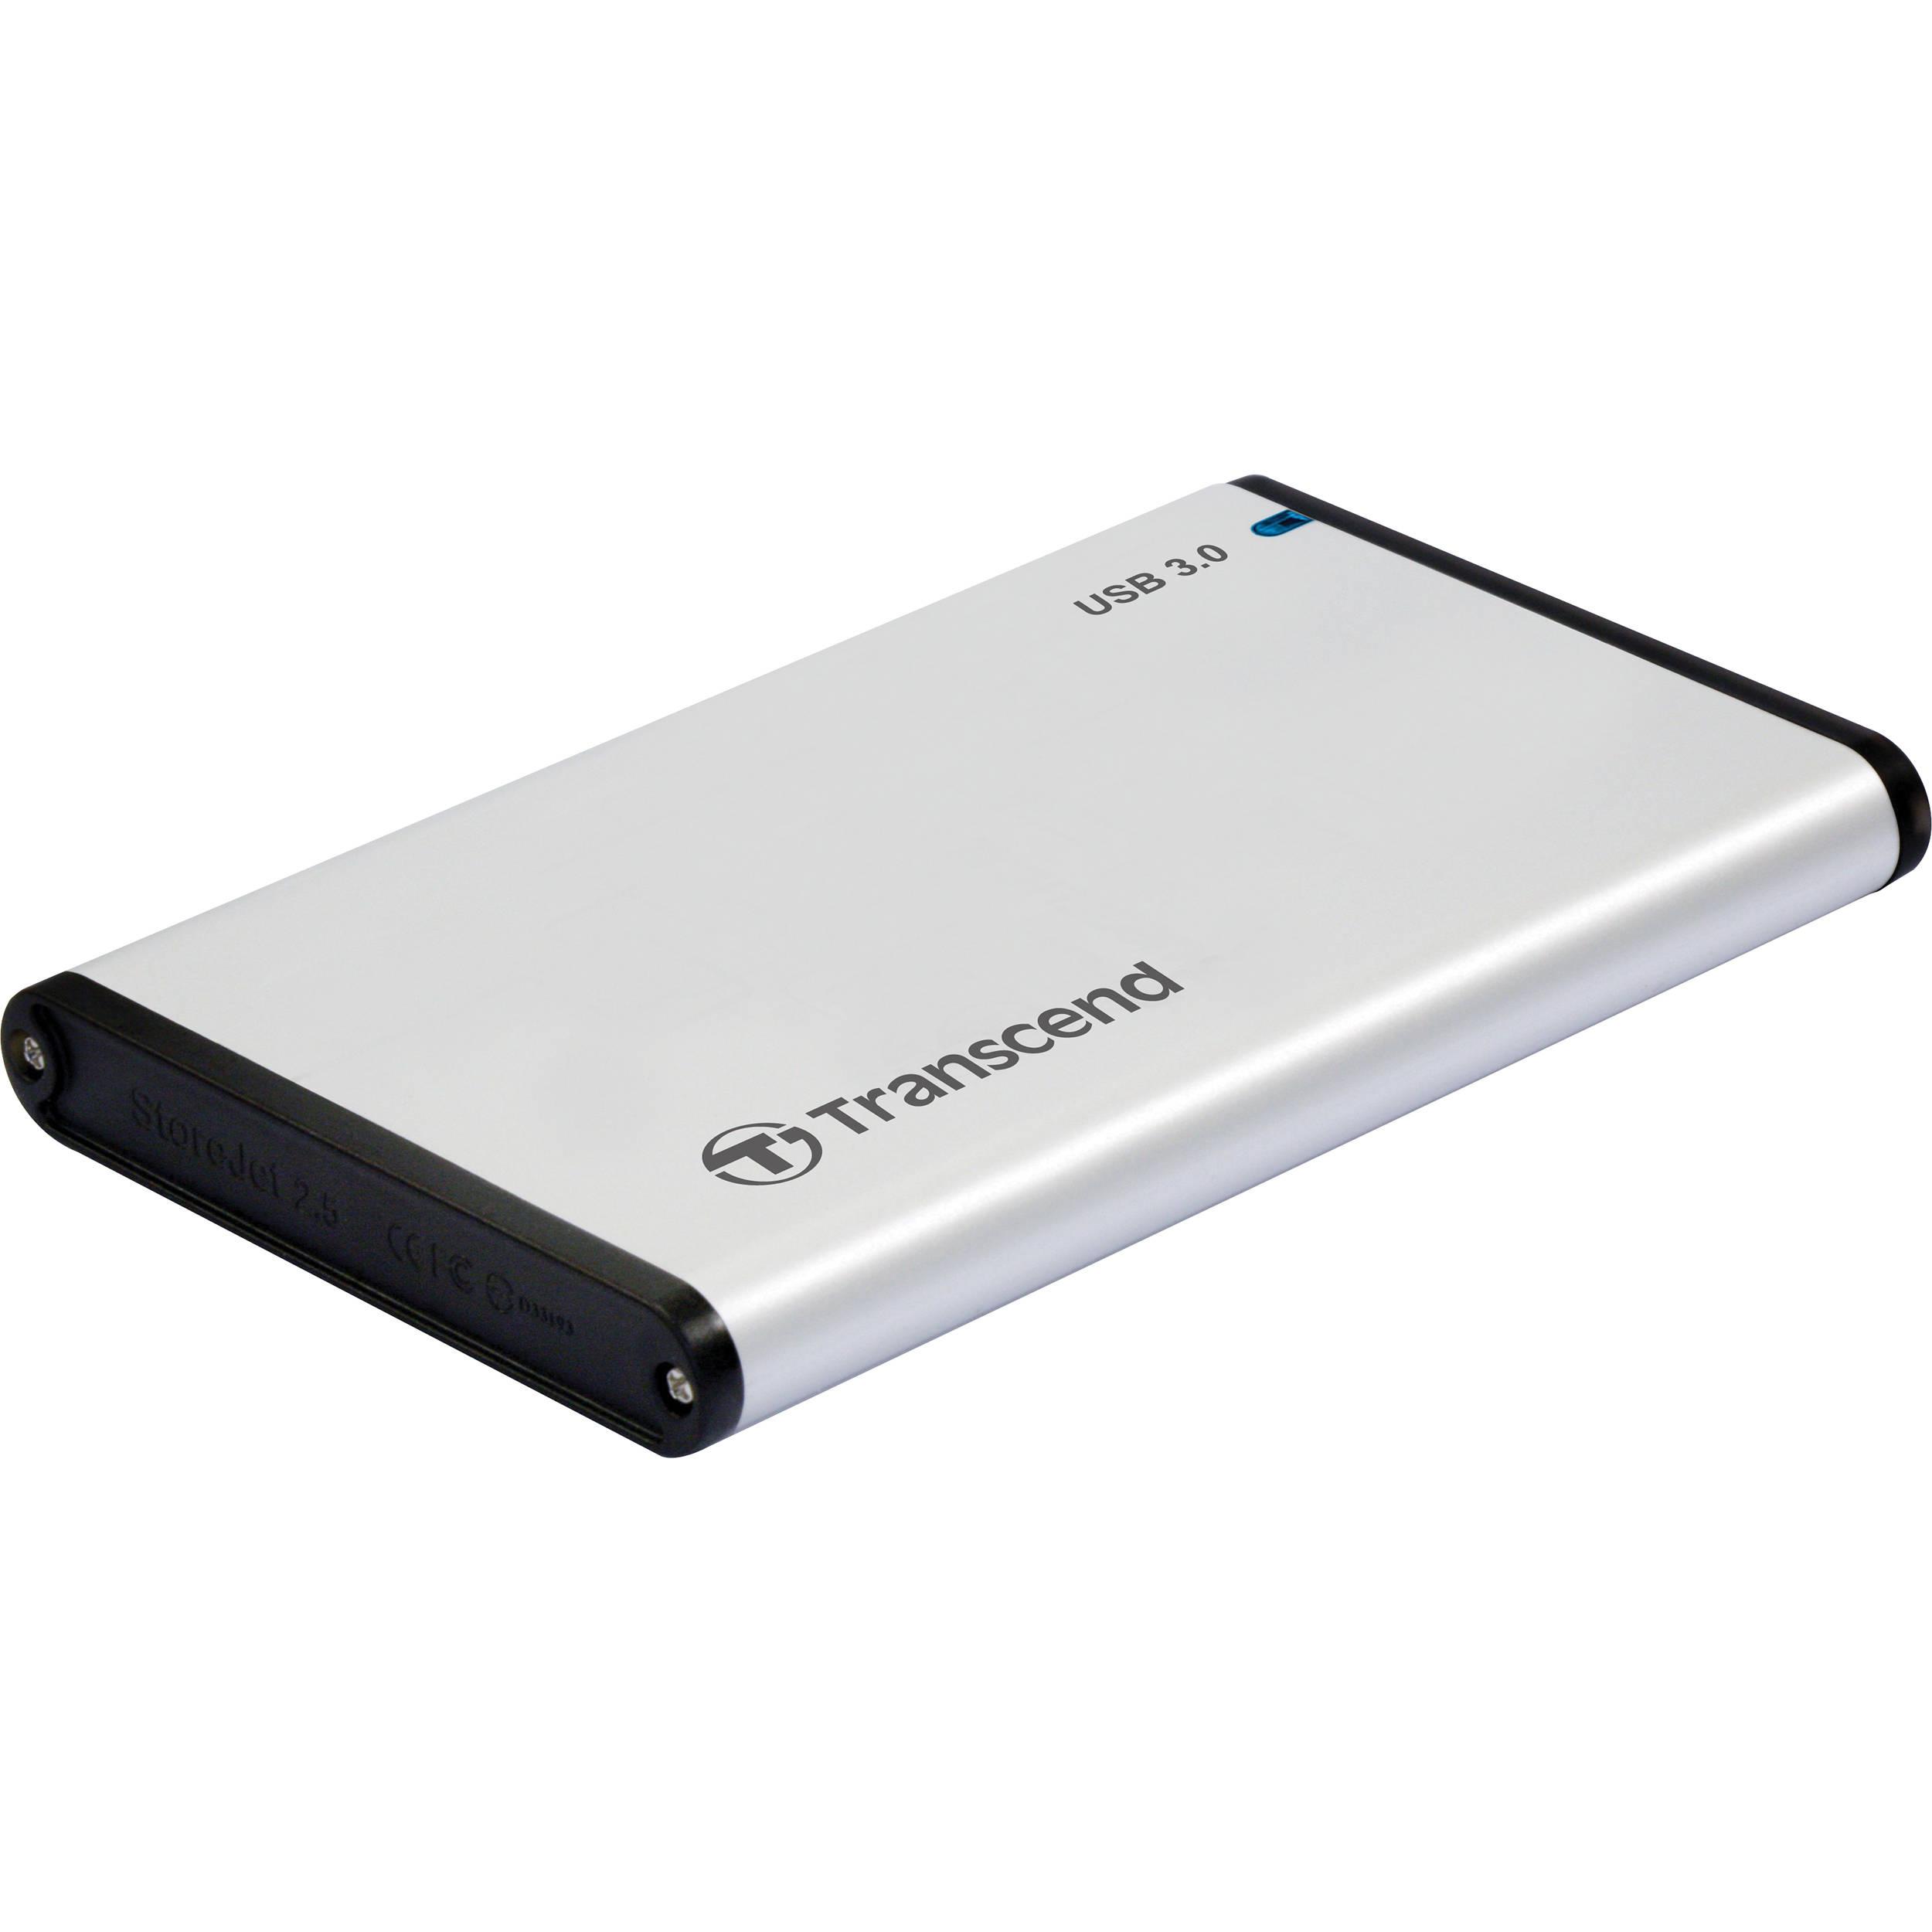 Transcend StoreJet 25S3 USB 3.0 Enclosure